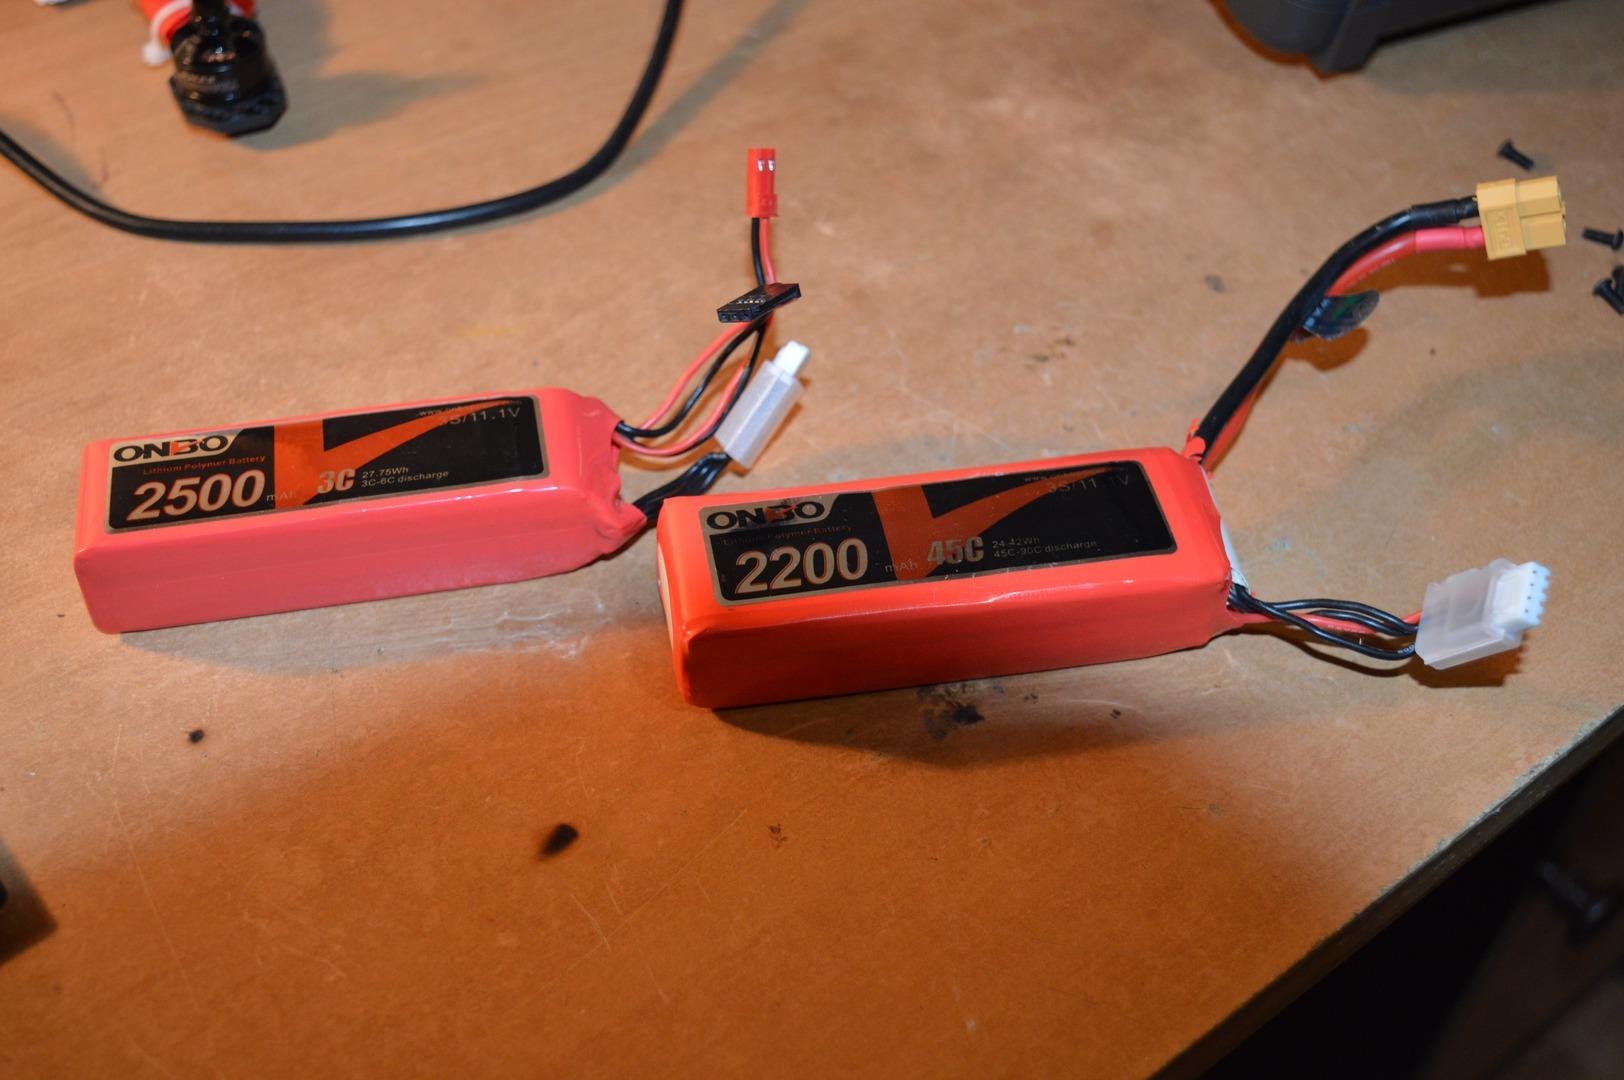 Как новичку собрать квадрокоптер ZMR250 - QAV250 с Aliexpress (1 часть) - 4